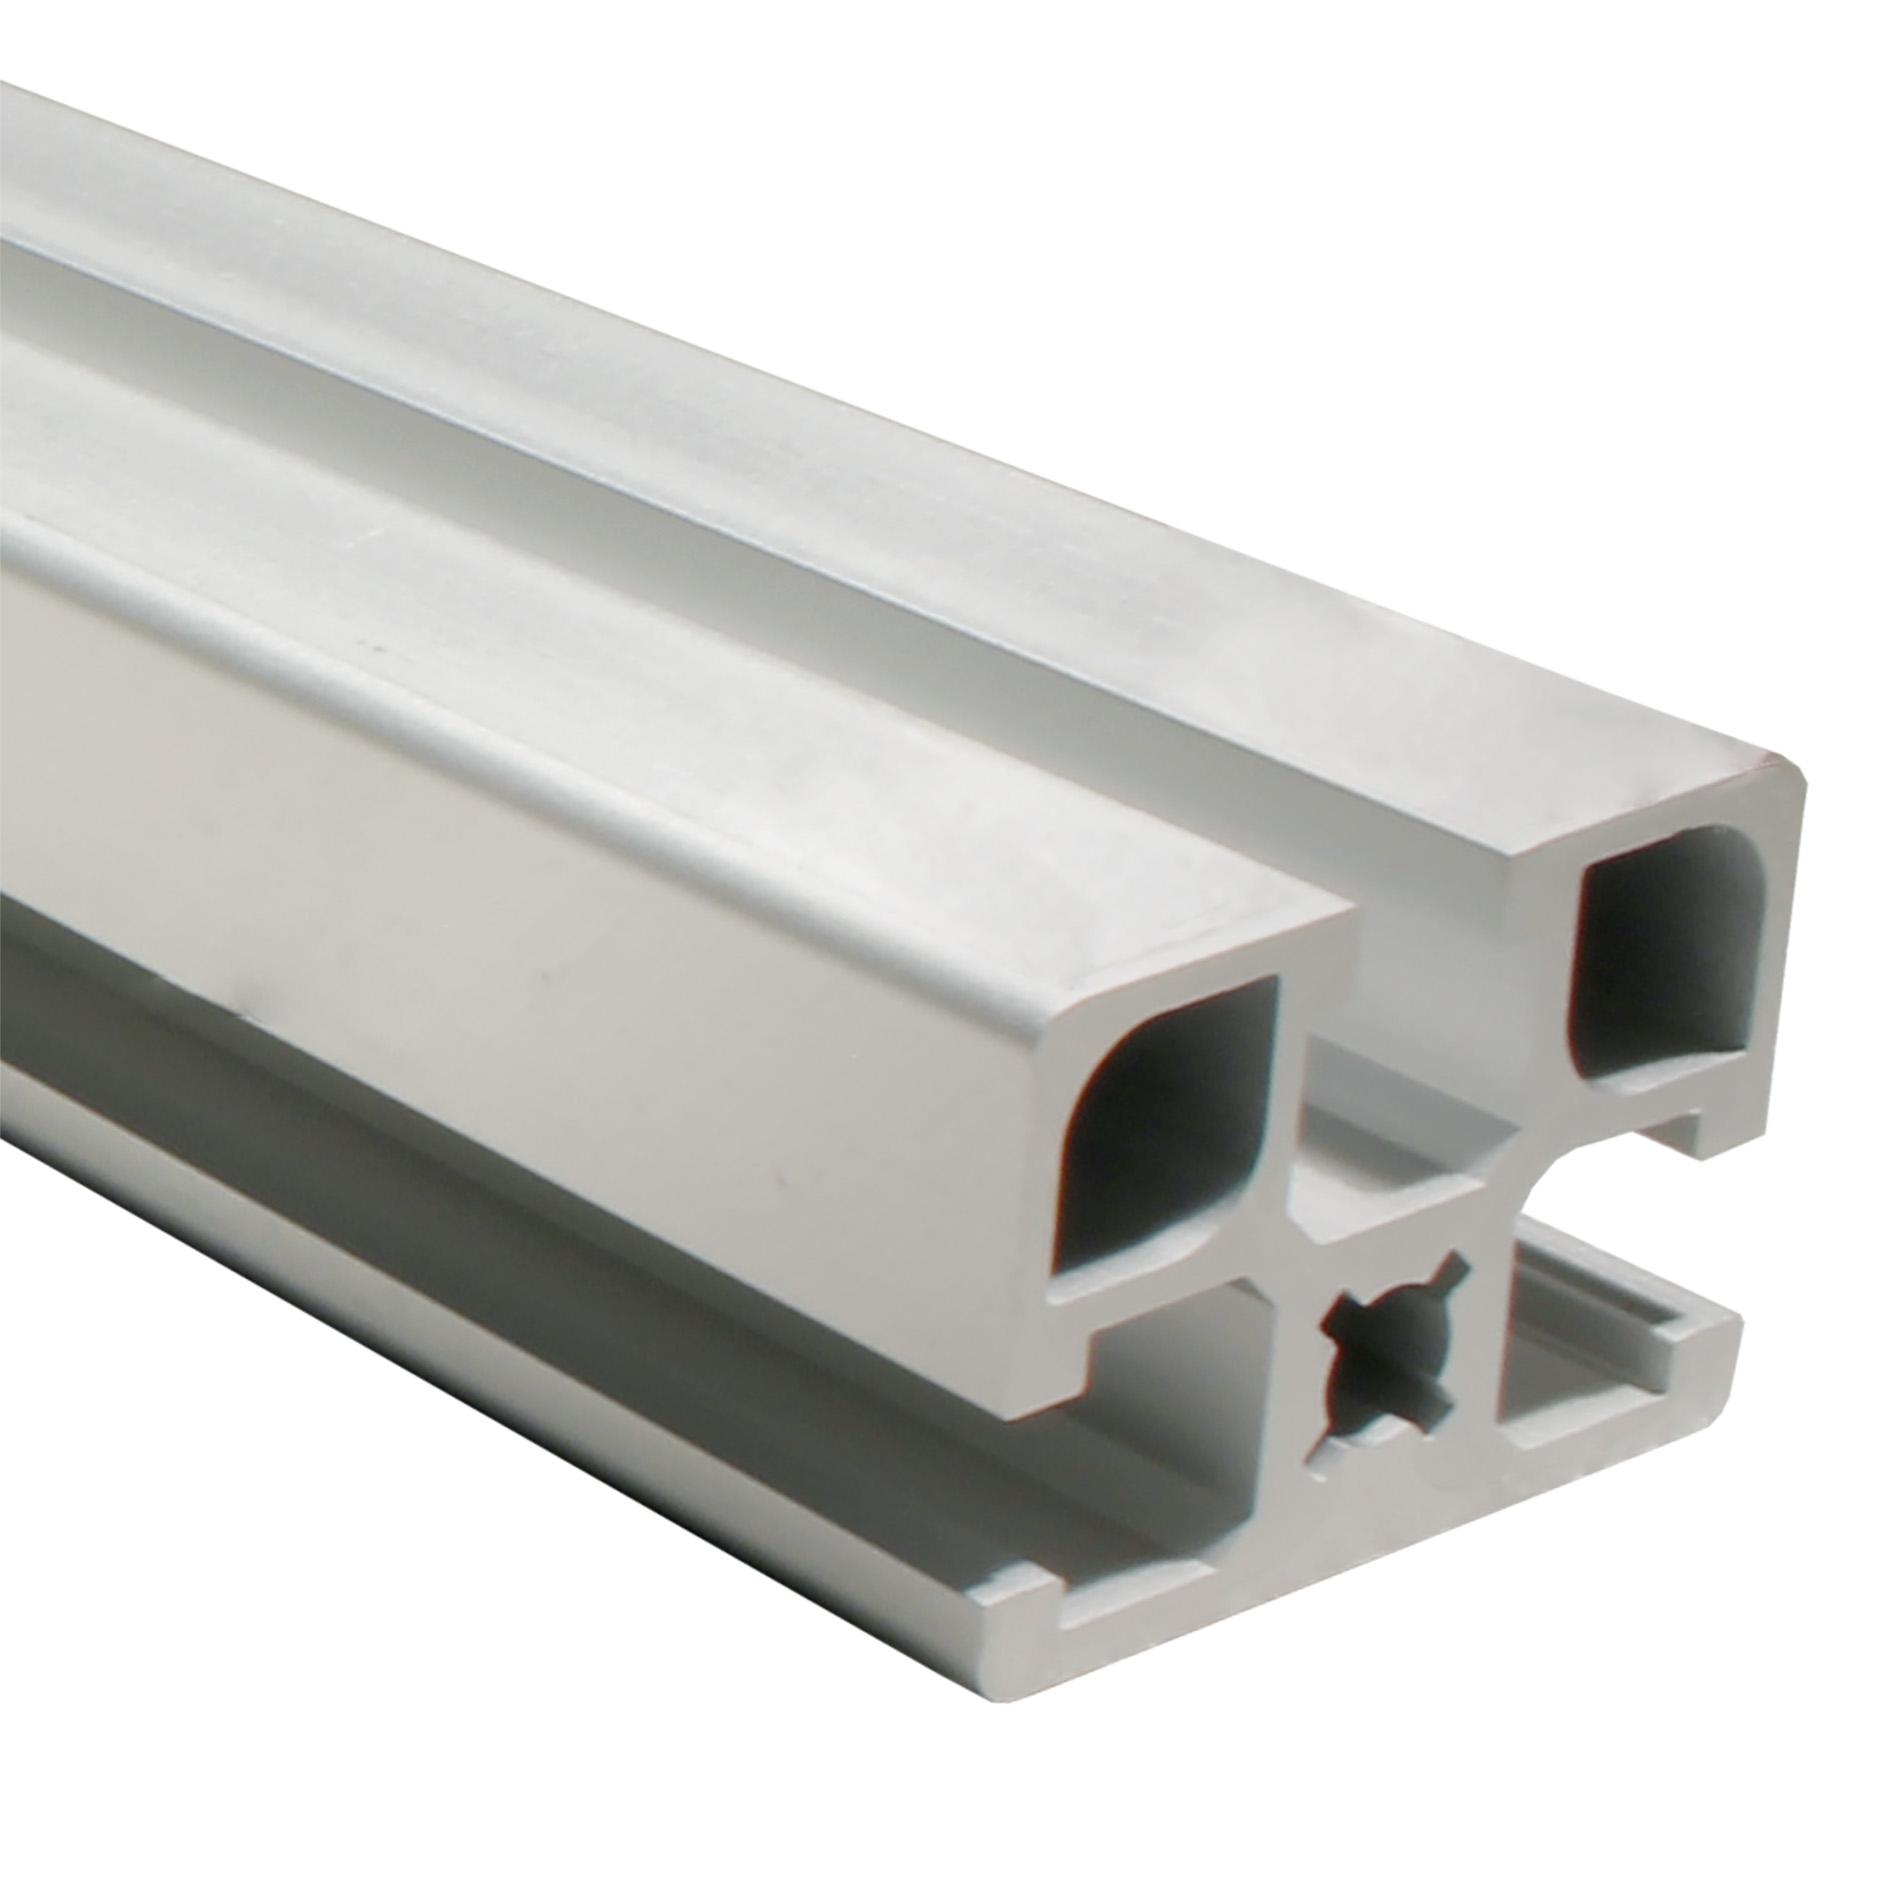 Standard aluminium profile - 45 x 32 mm -  -